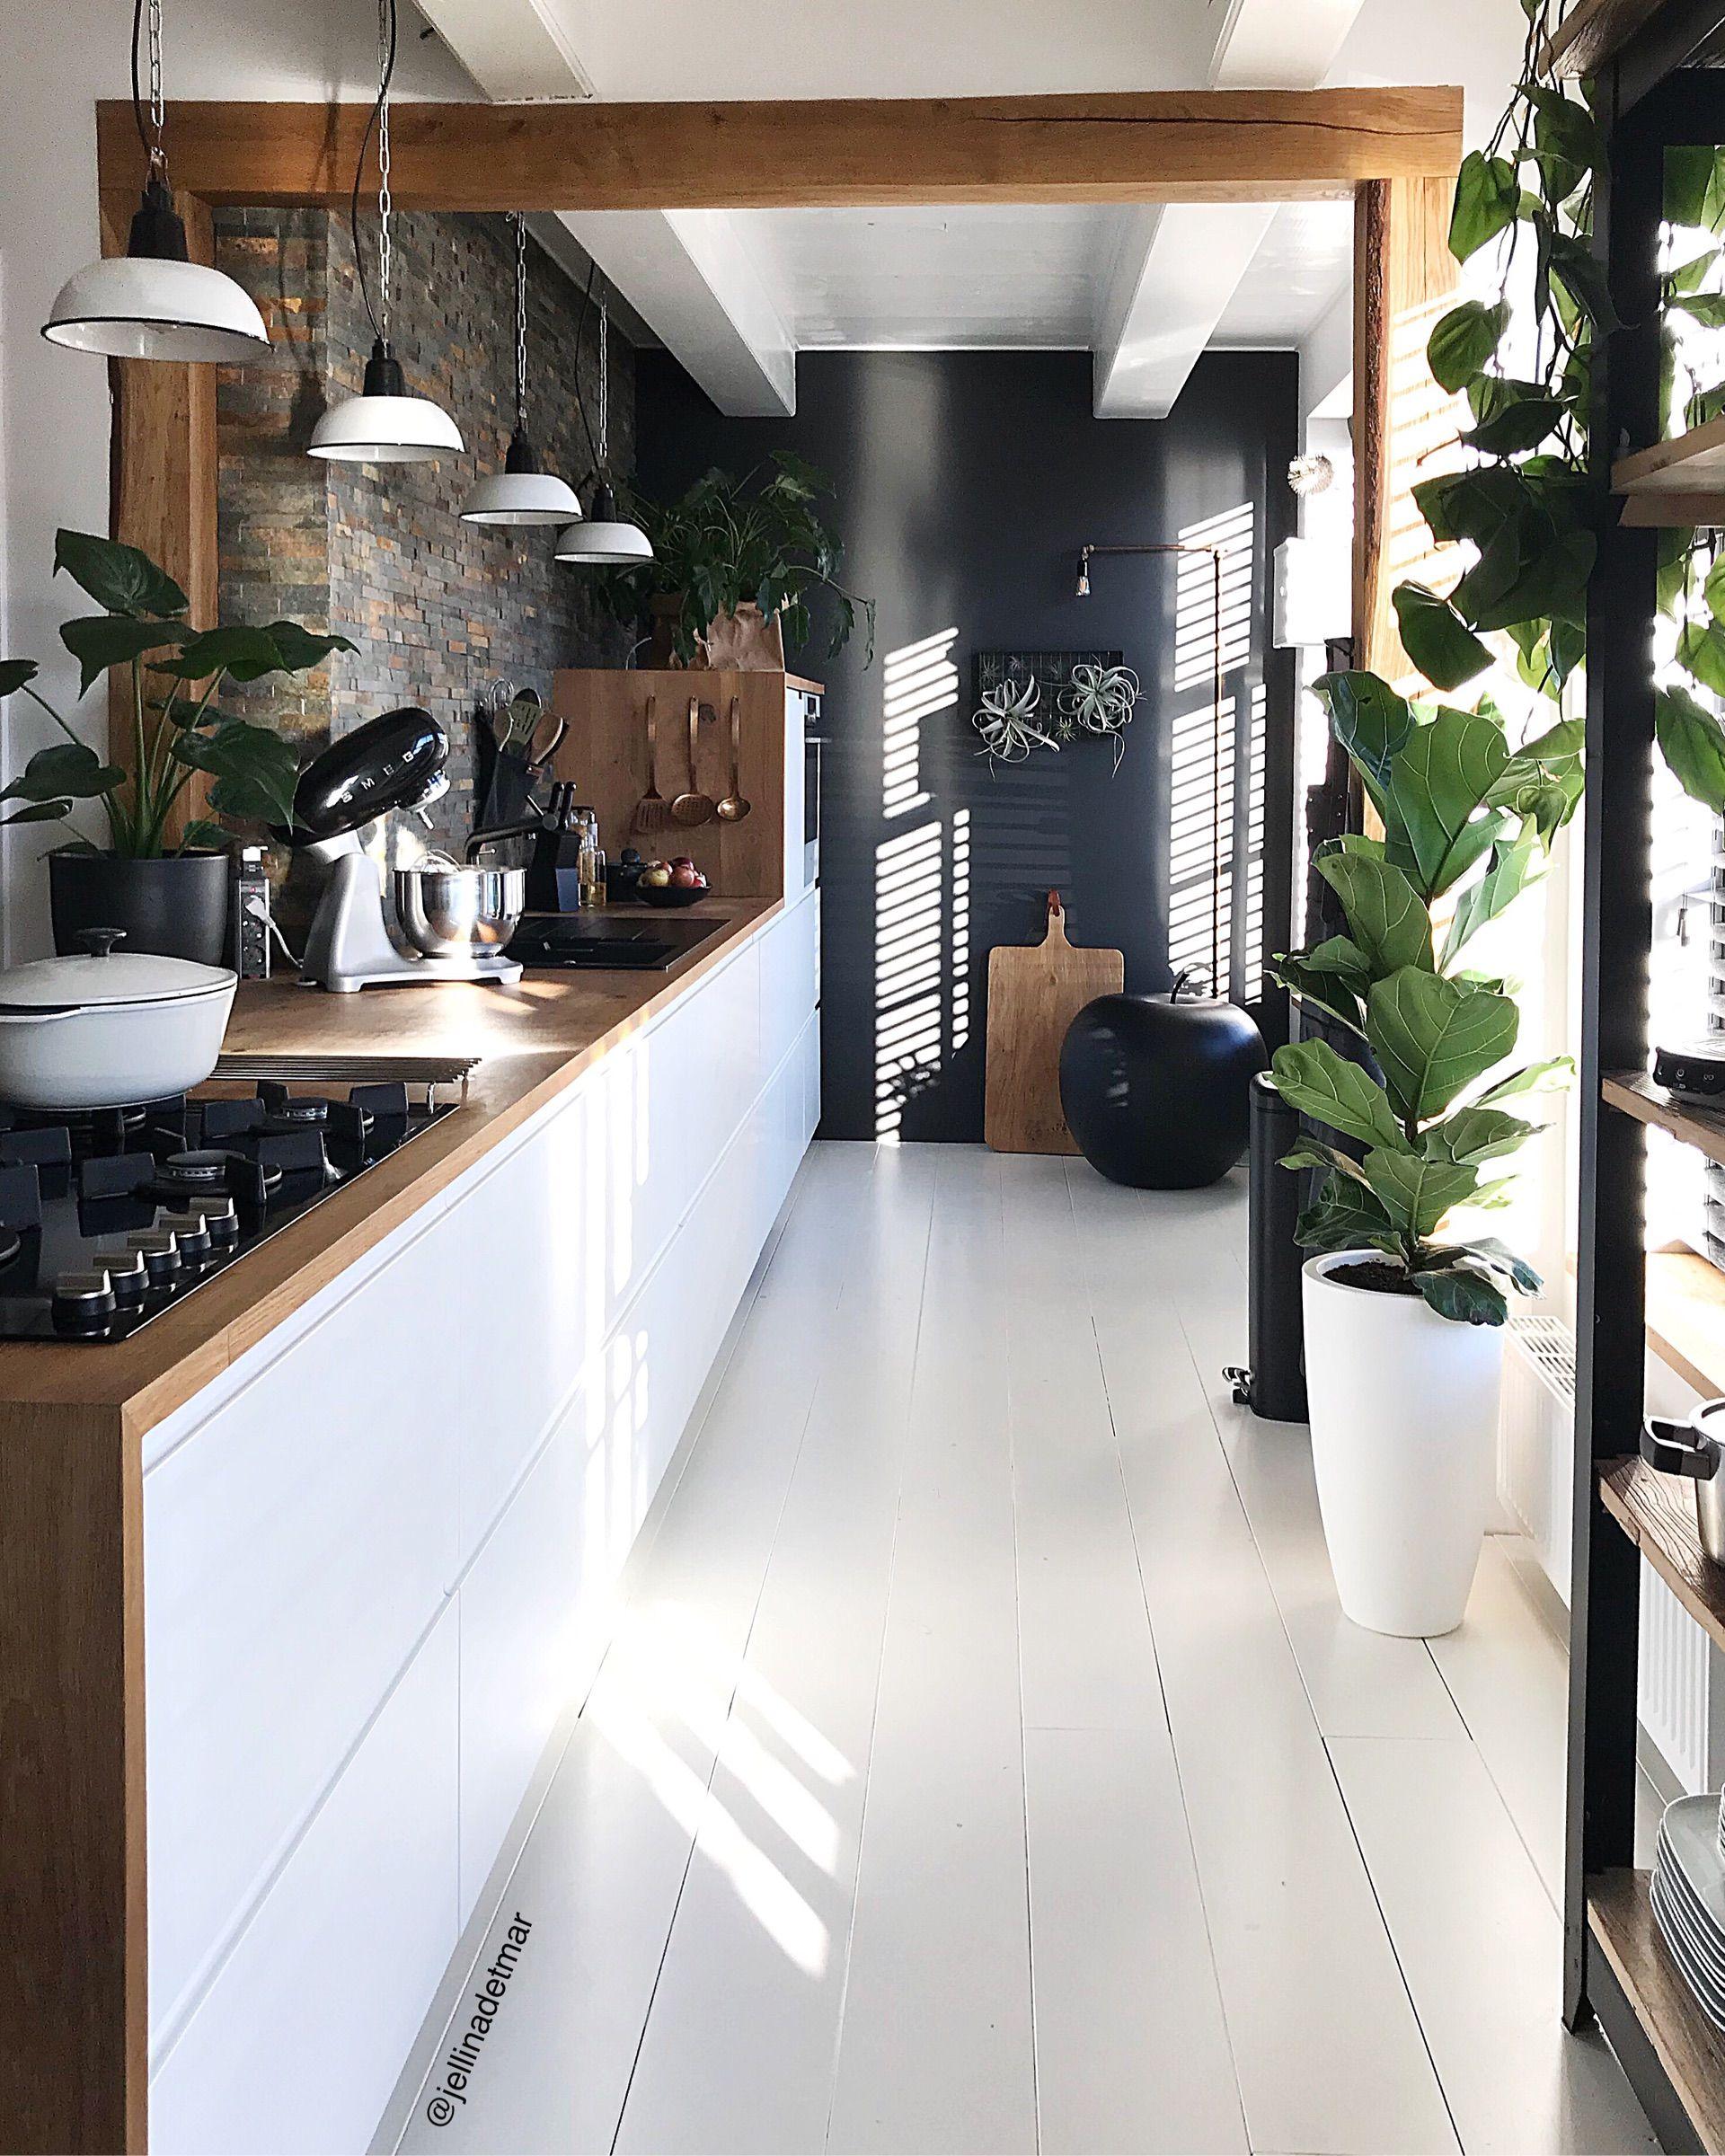 Küchengestaltung im europäischen stil keuken  binnenkijken bij jellinadetmar  pinterest  cocinas casas